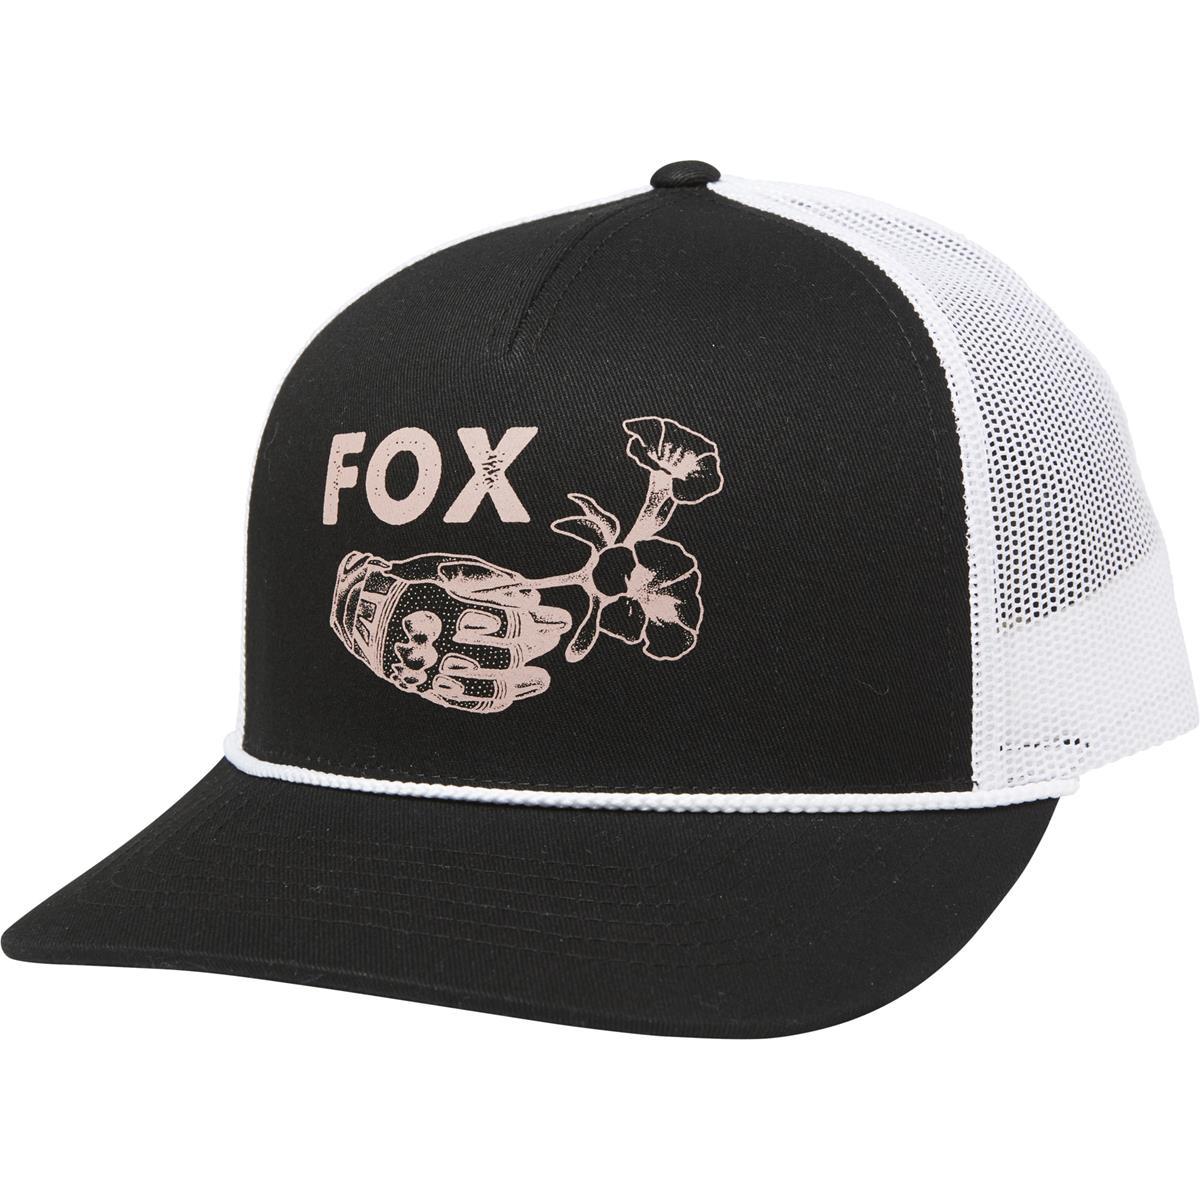 Fox Girls Snapback Cap Live Fast Schwarz